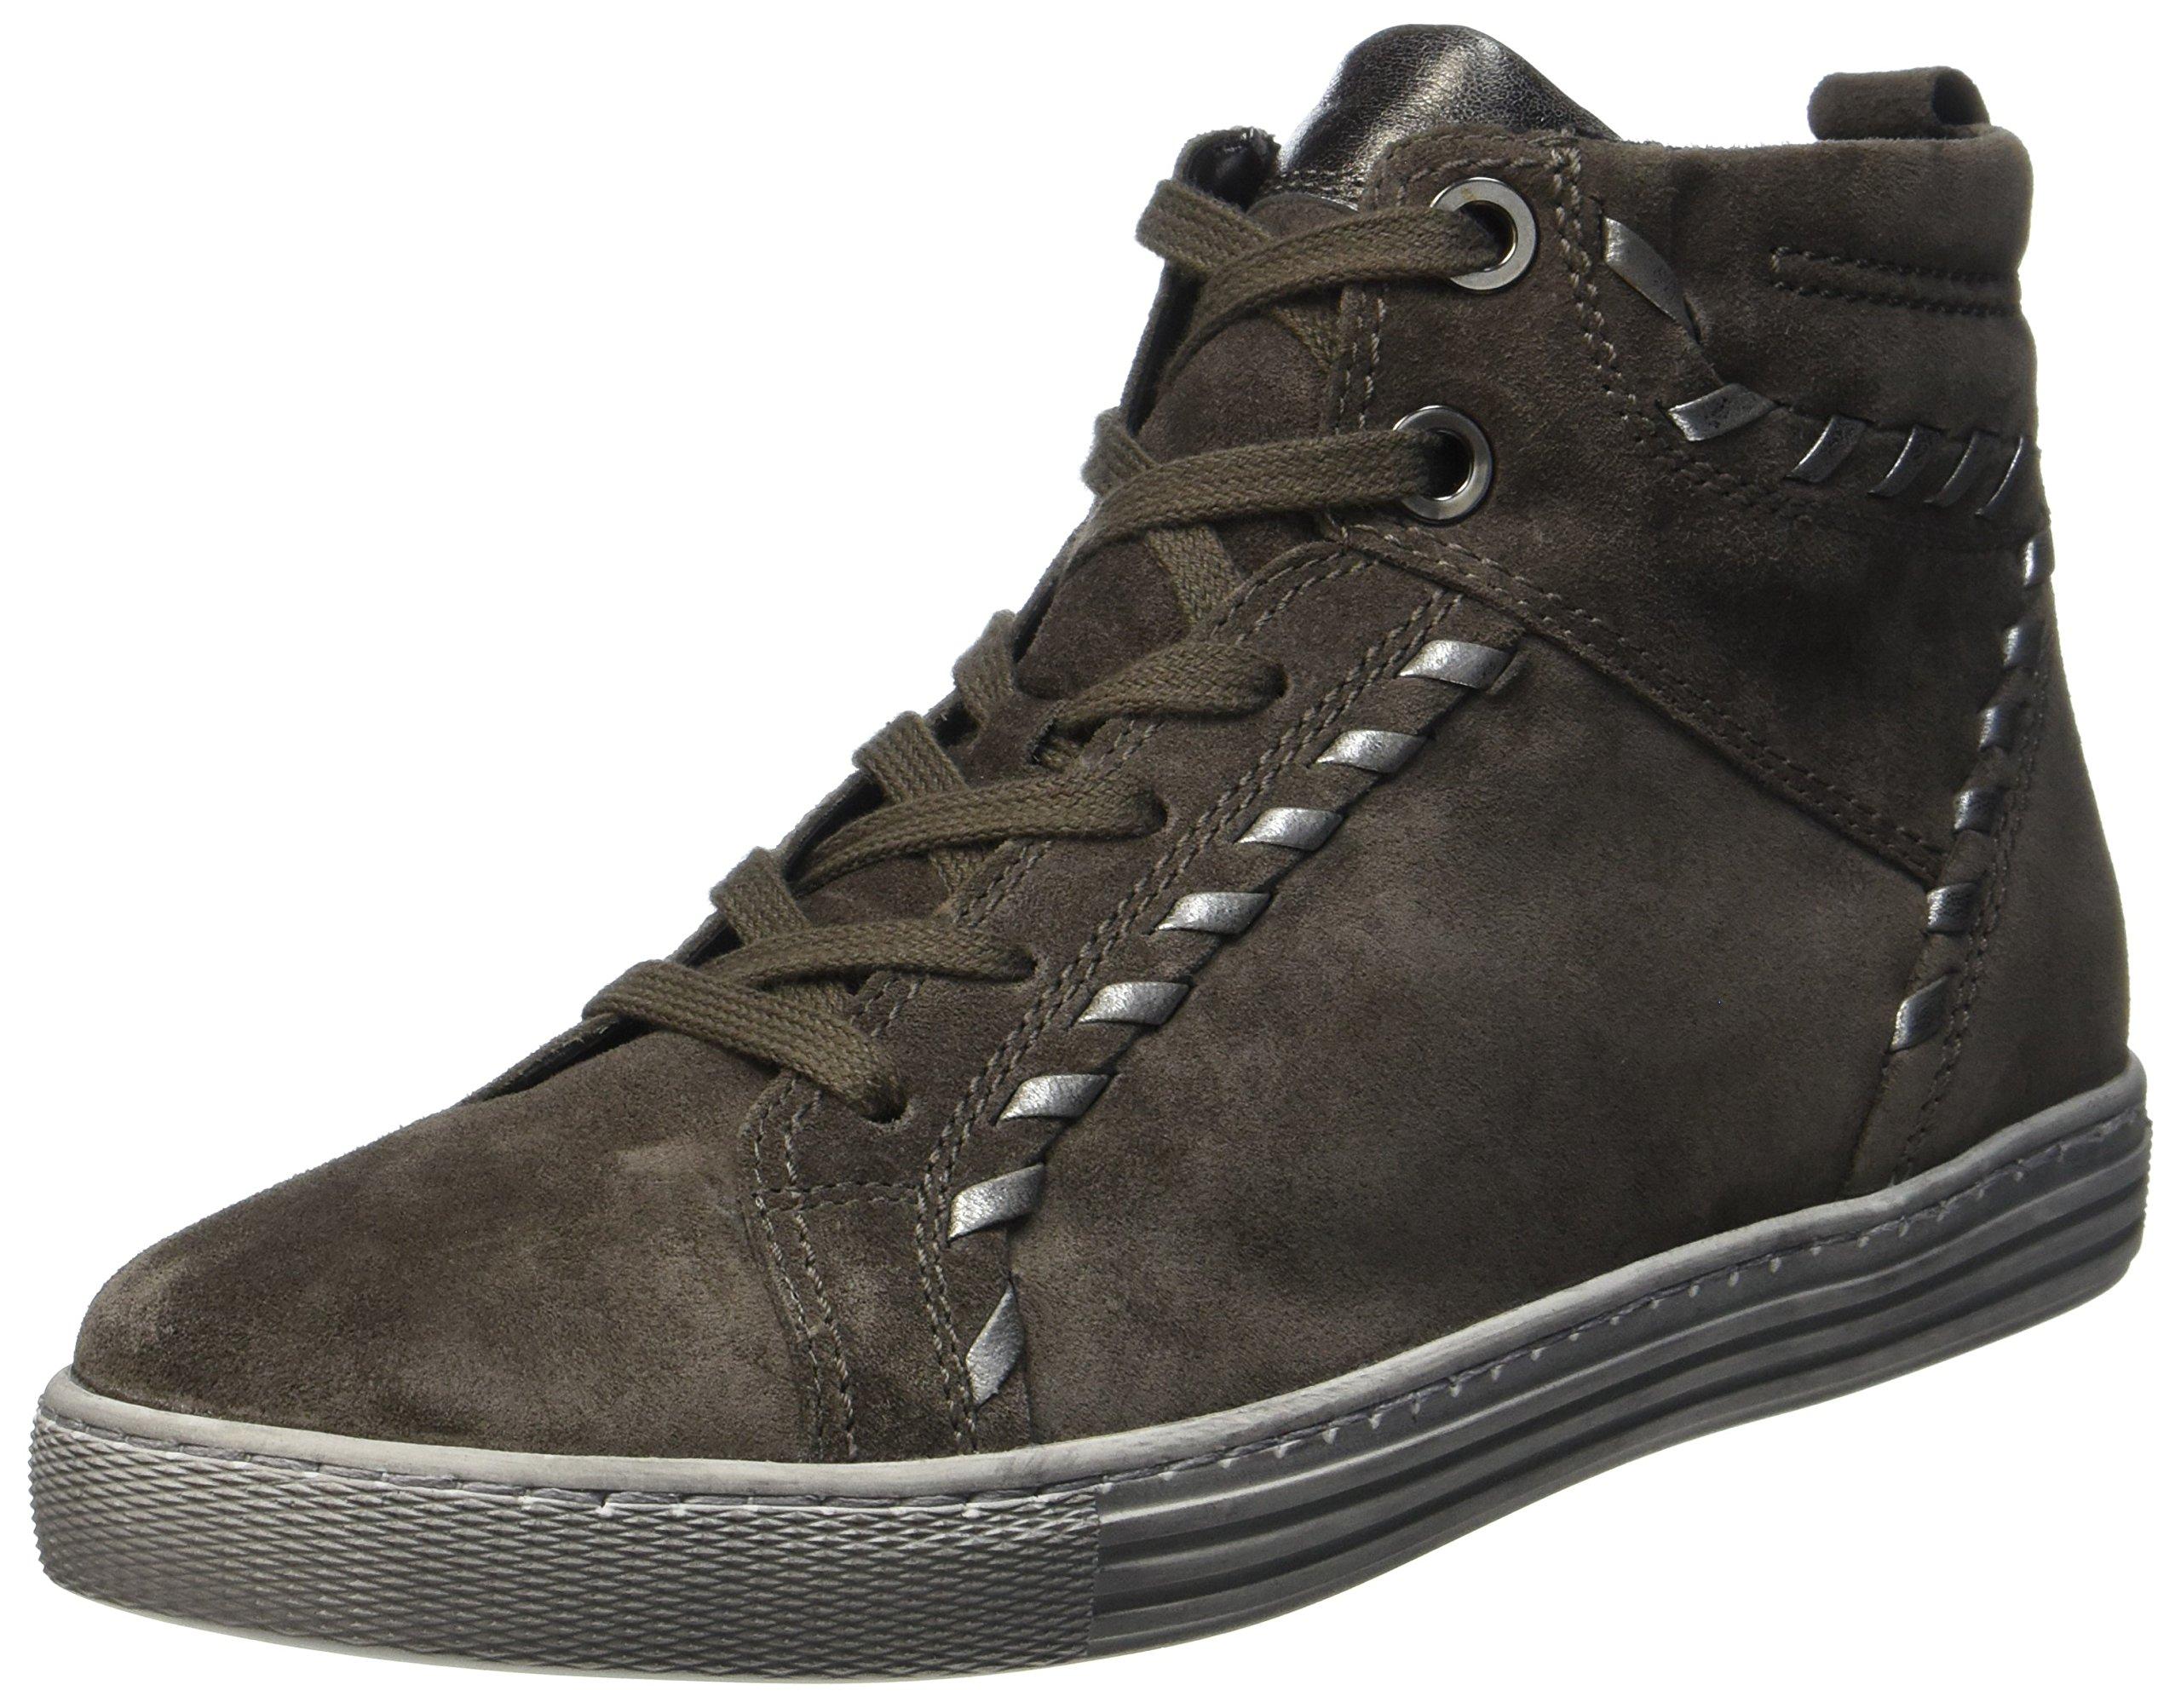 Eu Gabor BasicDerbys Comfort FemmeGris30 Micro41 Shoes Anthrazit OiZuPkX